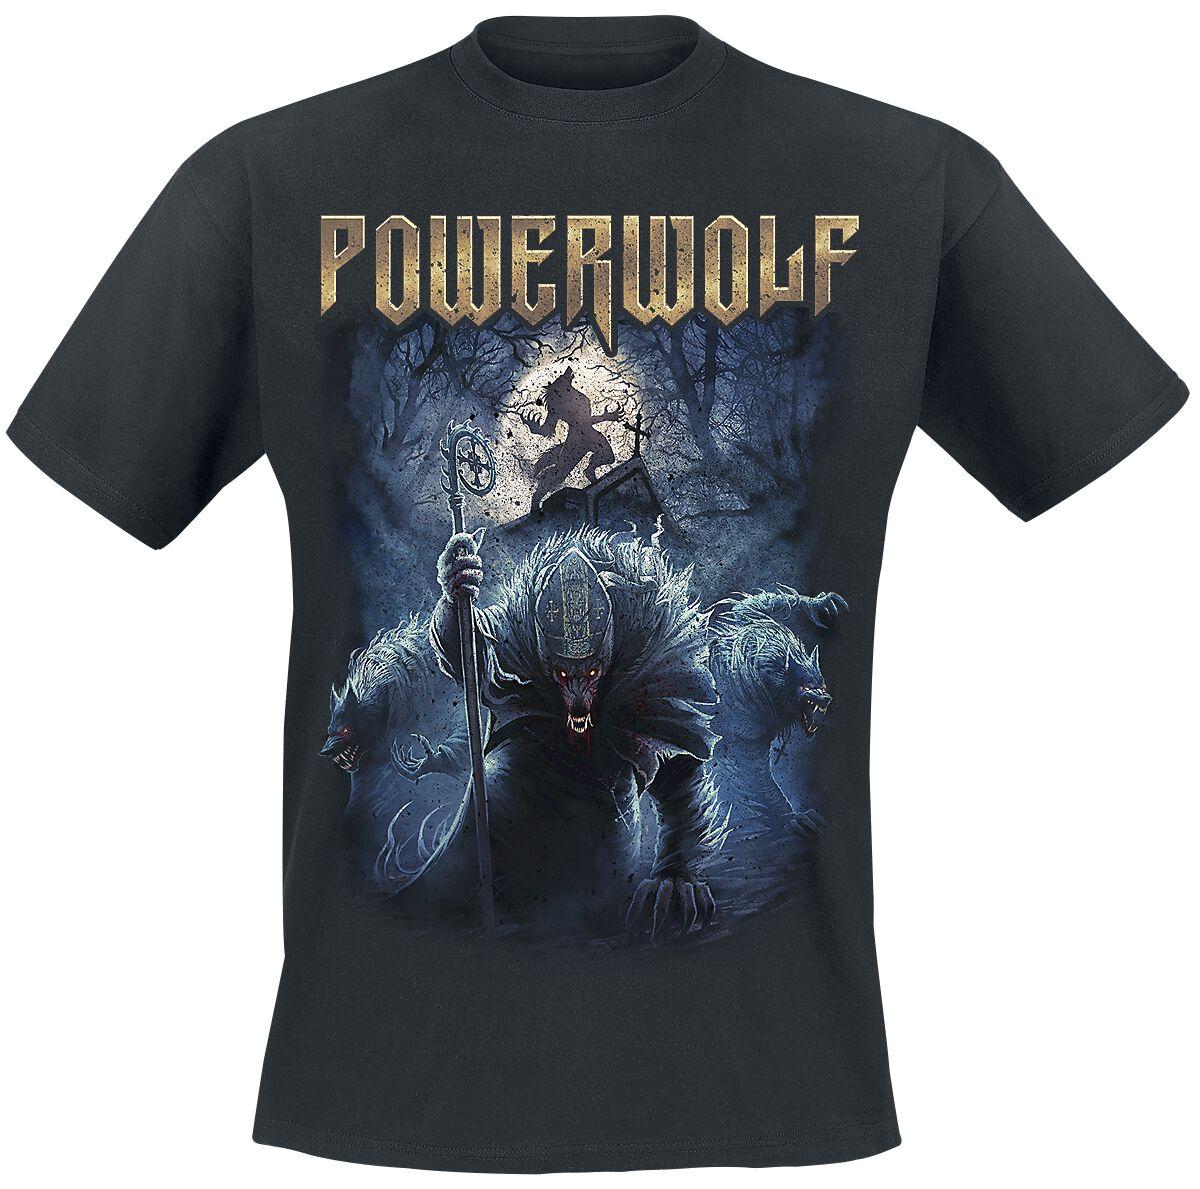 Image of   Powerwolf Night Of The Werewolves T-Shirt sort